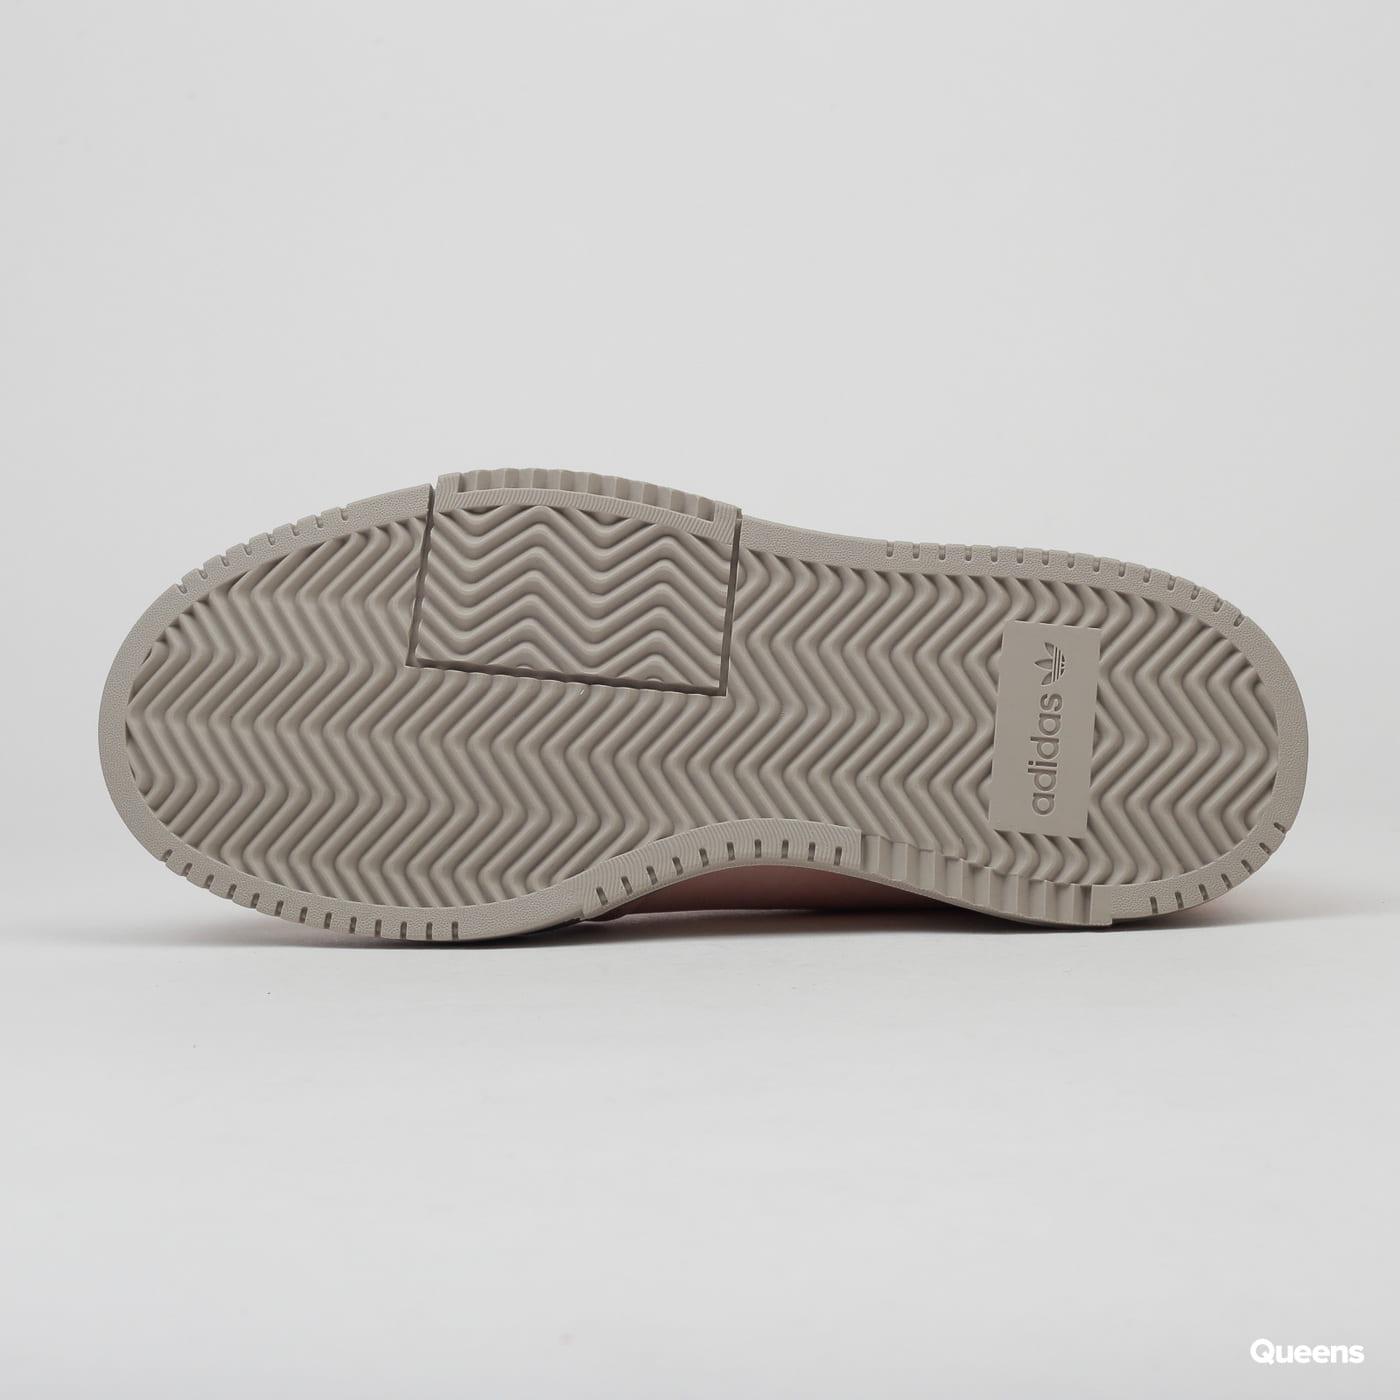 adidas Originals SC Premiere W vappnk / vappnk / lbrown